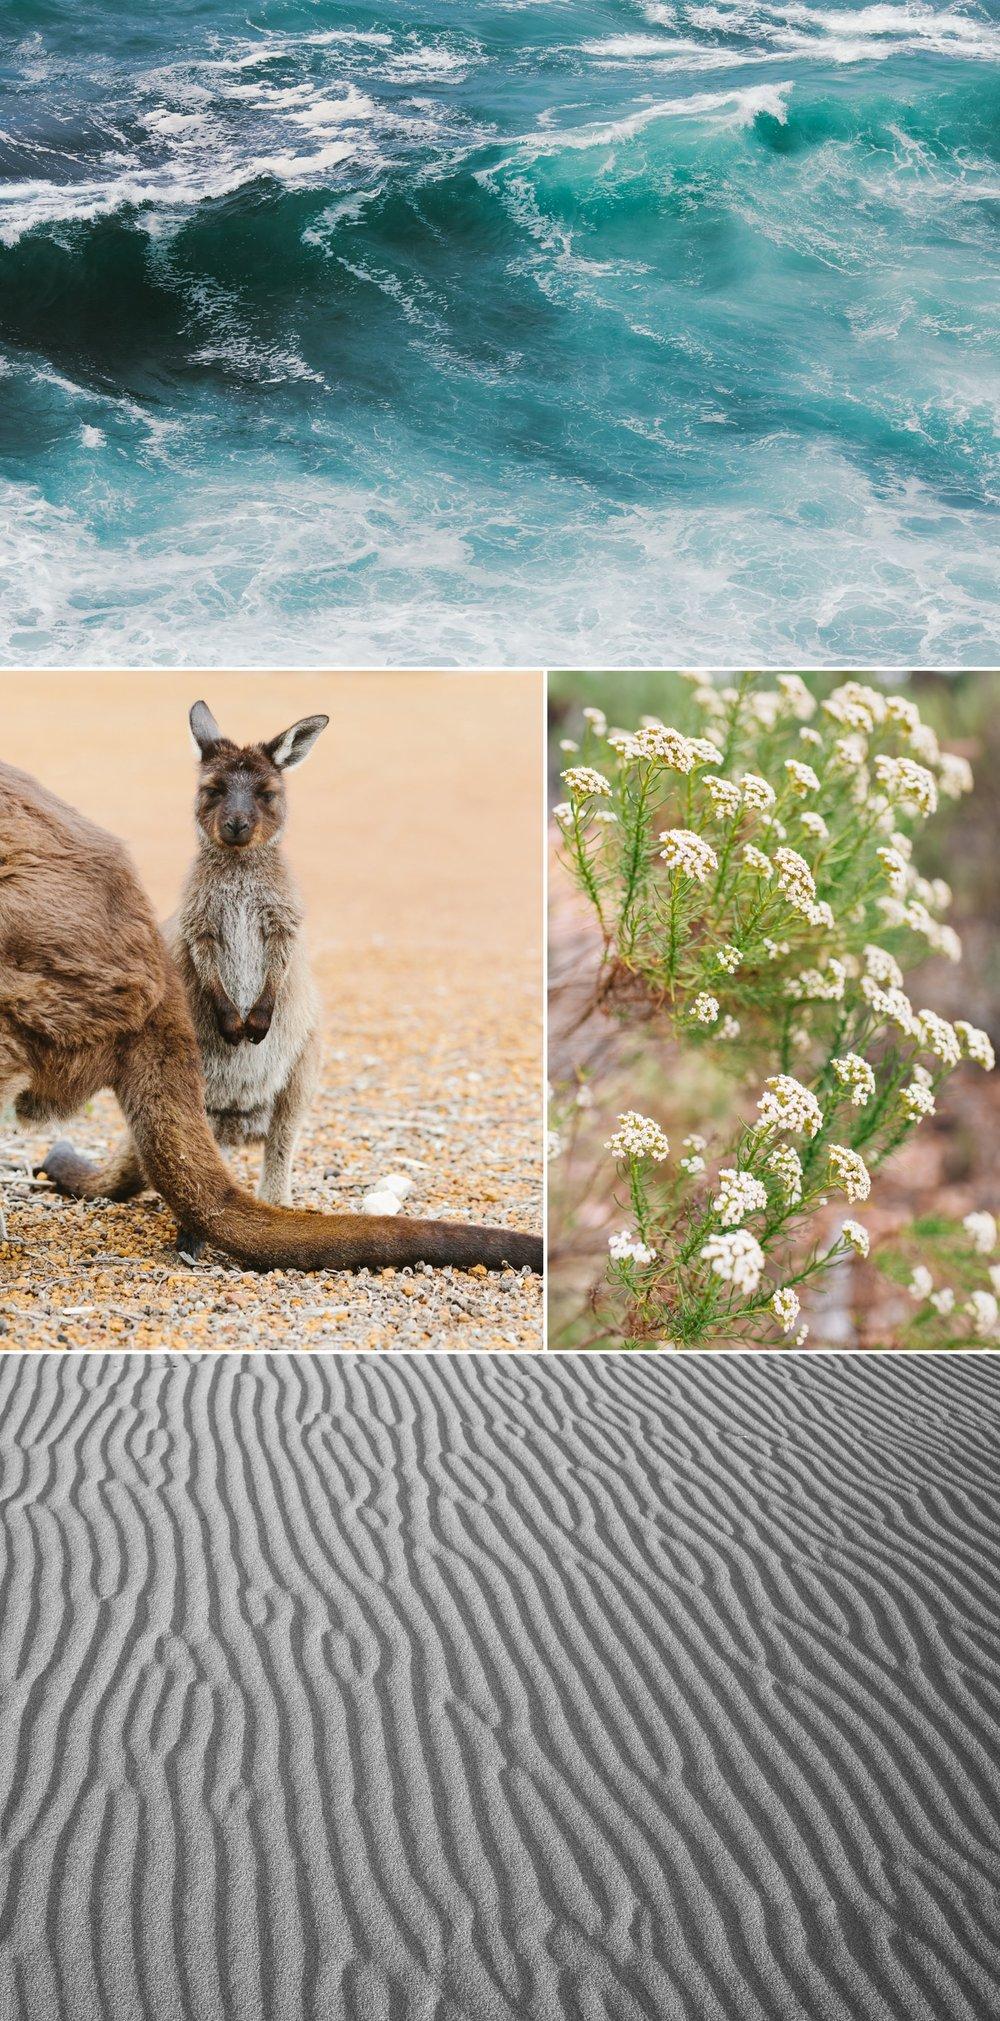 cameron-zegers-seattle-photographer-kangaroo-island-australia-travel_0011.jpg